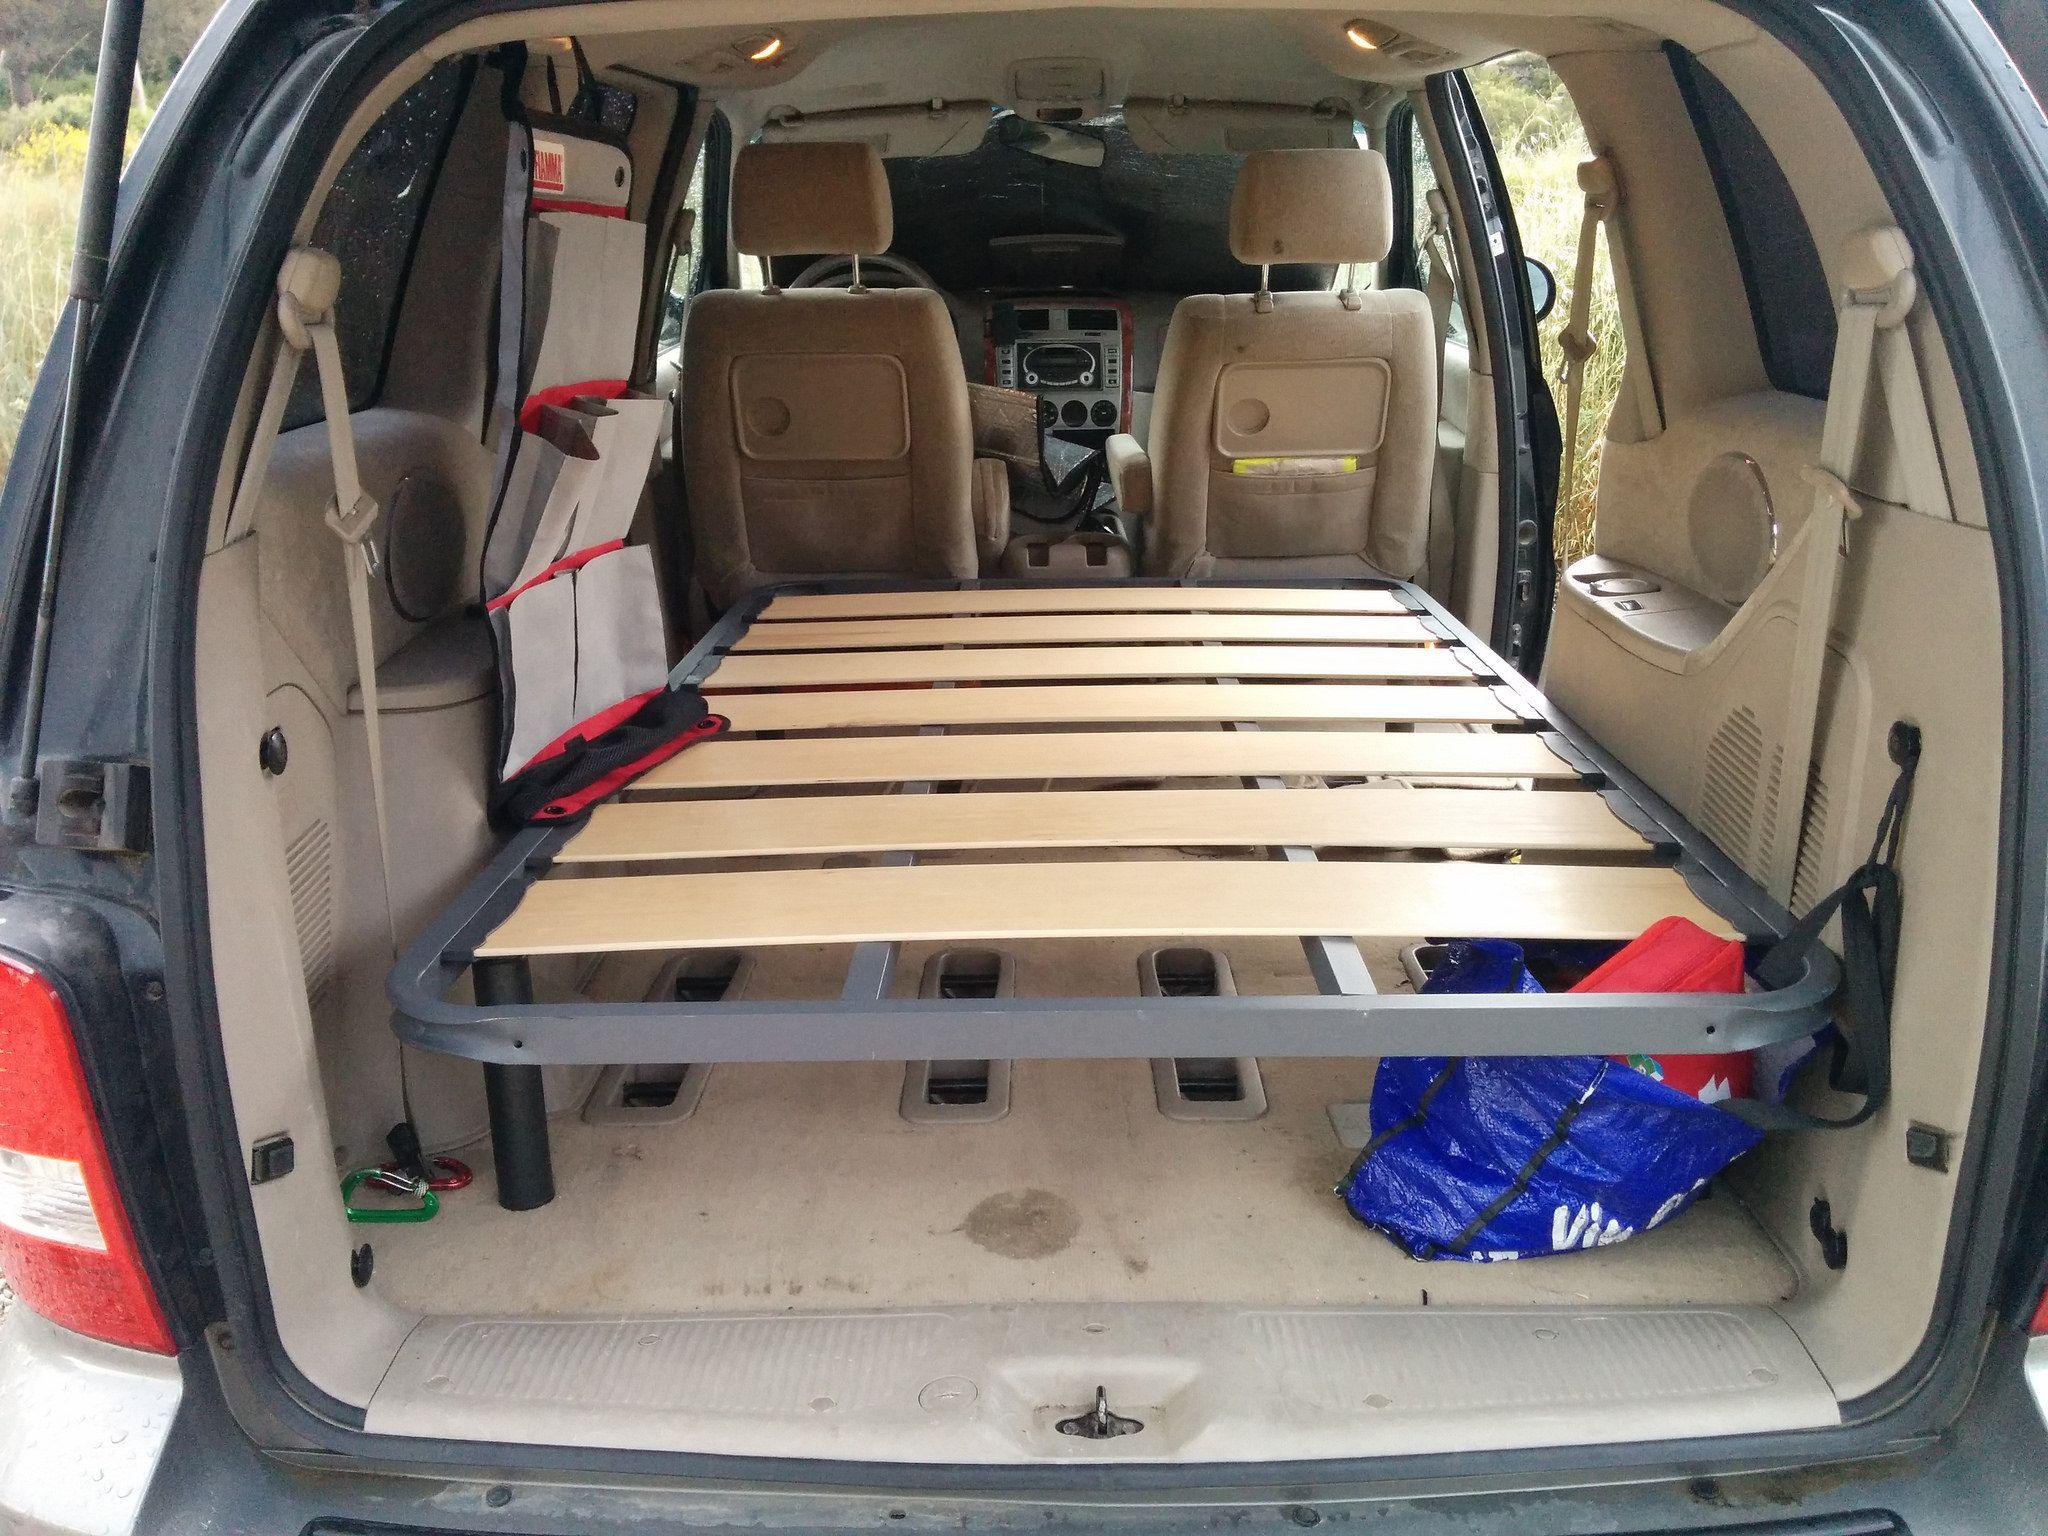 Metal Bed Frame Minivan Camping Bed